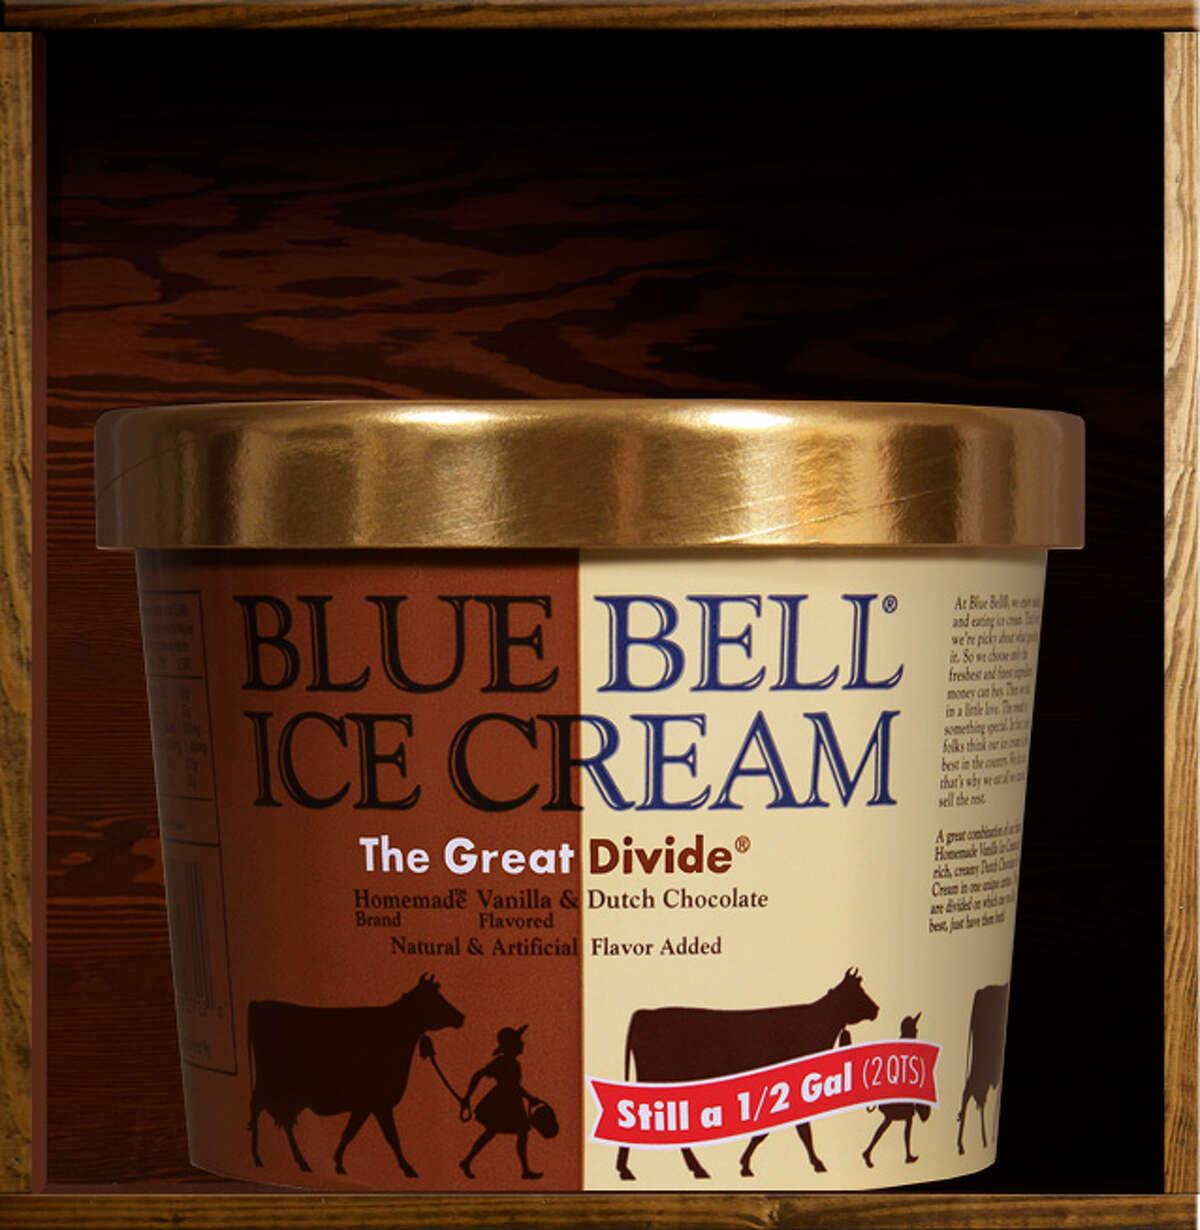 29. The Great Divide Blue Bell description: